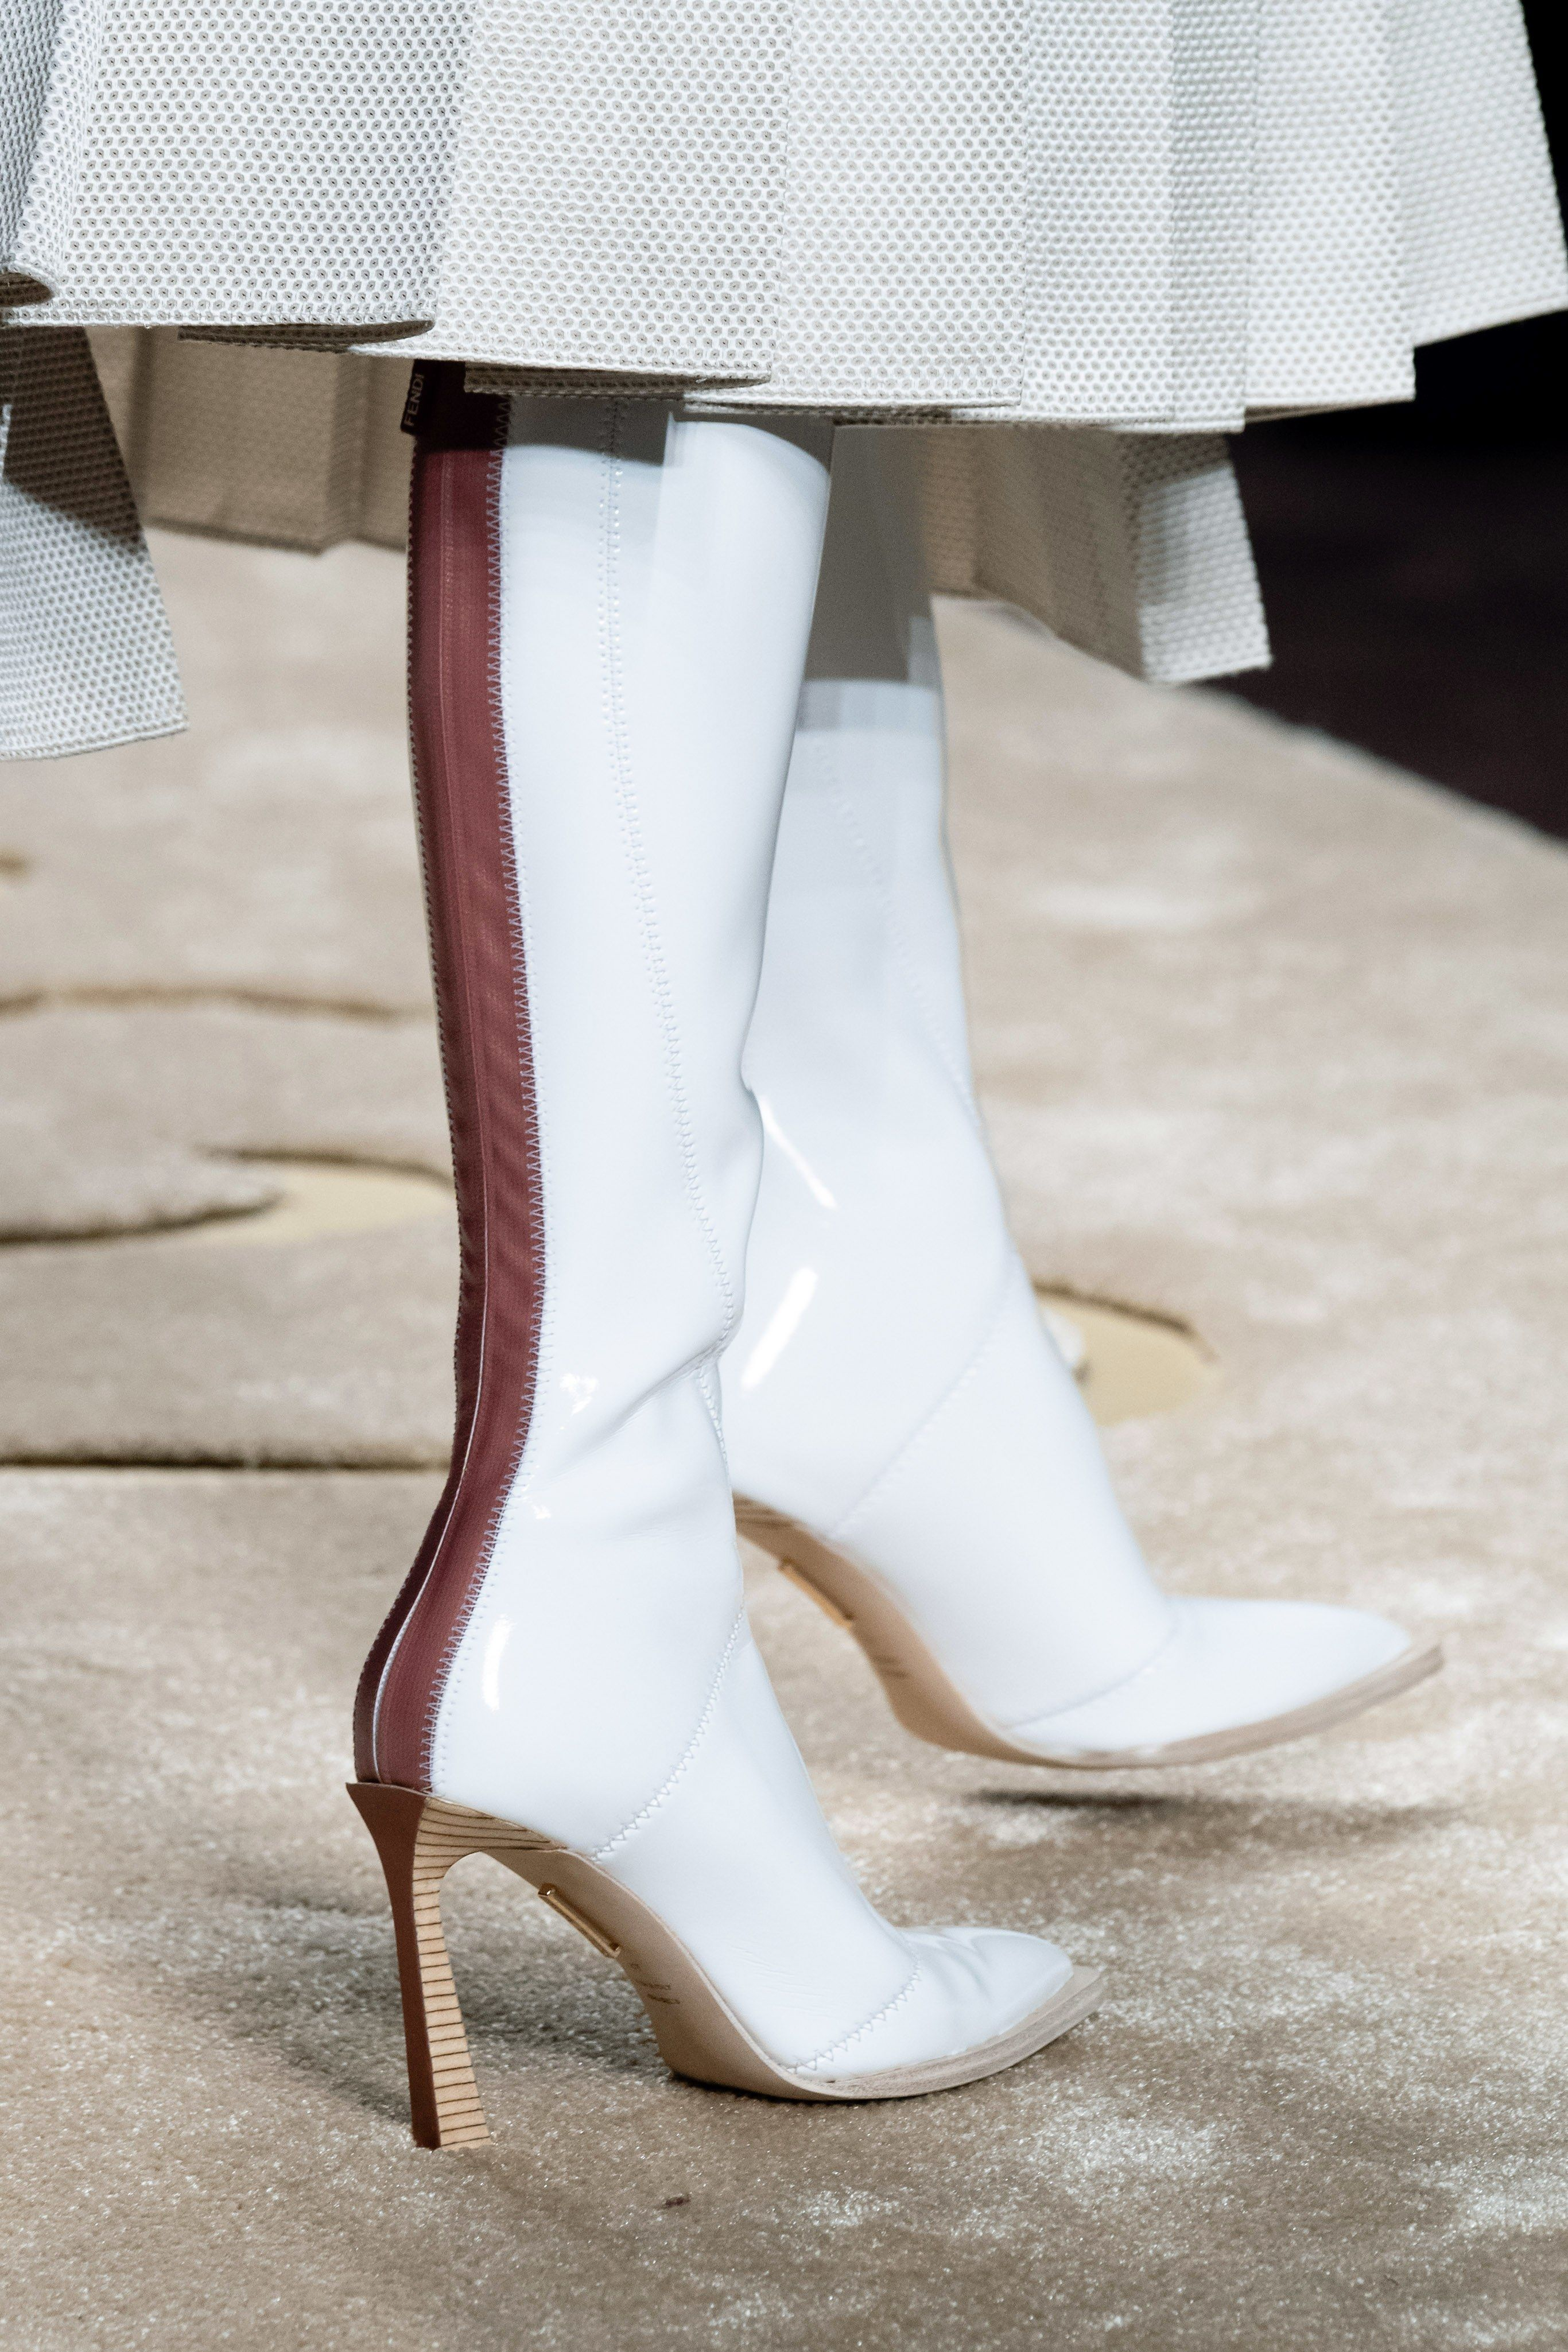 Pin on Παπούτσια και αξεσουάρ